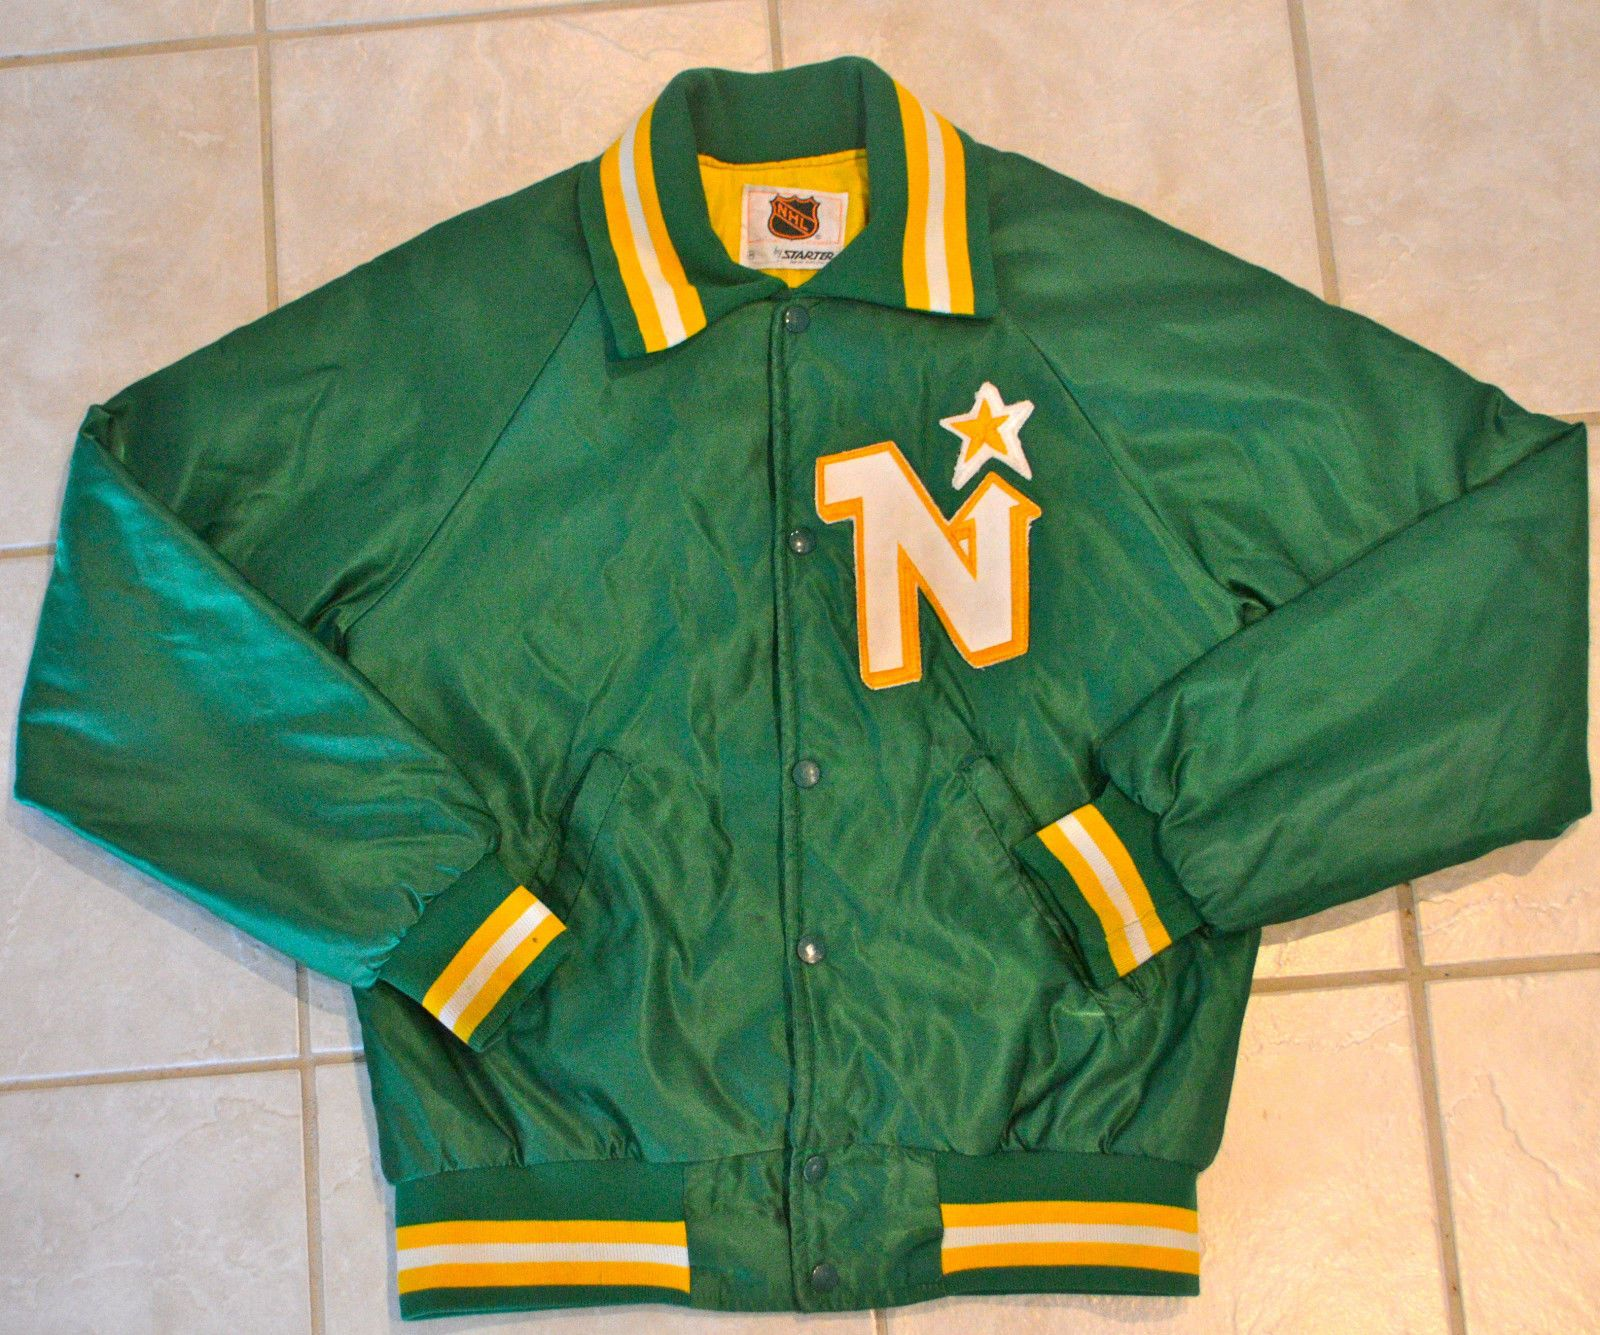 Vintage 80s Minnesota North Stars Starter Jacket Size Med Ebay Minnesota North Stars Retro Jacket North Star